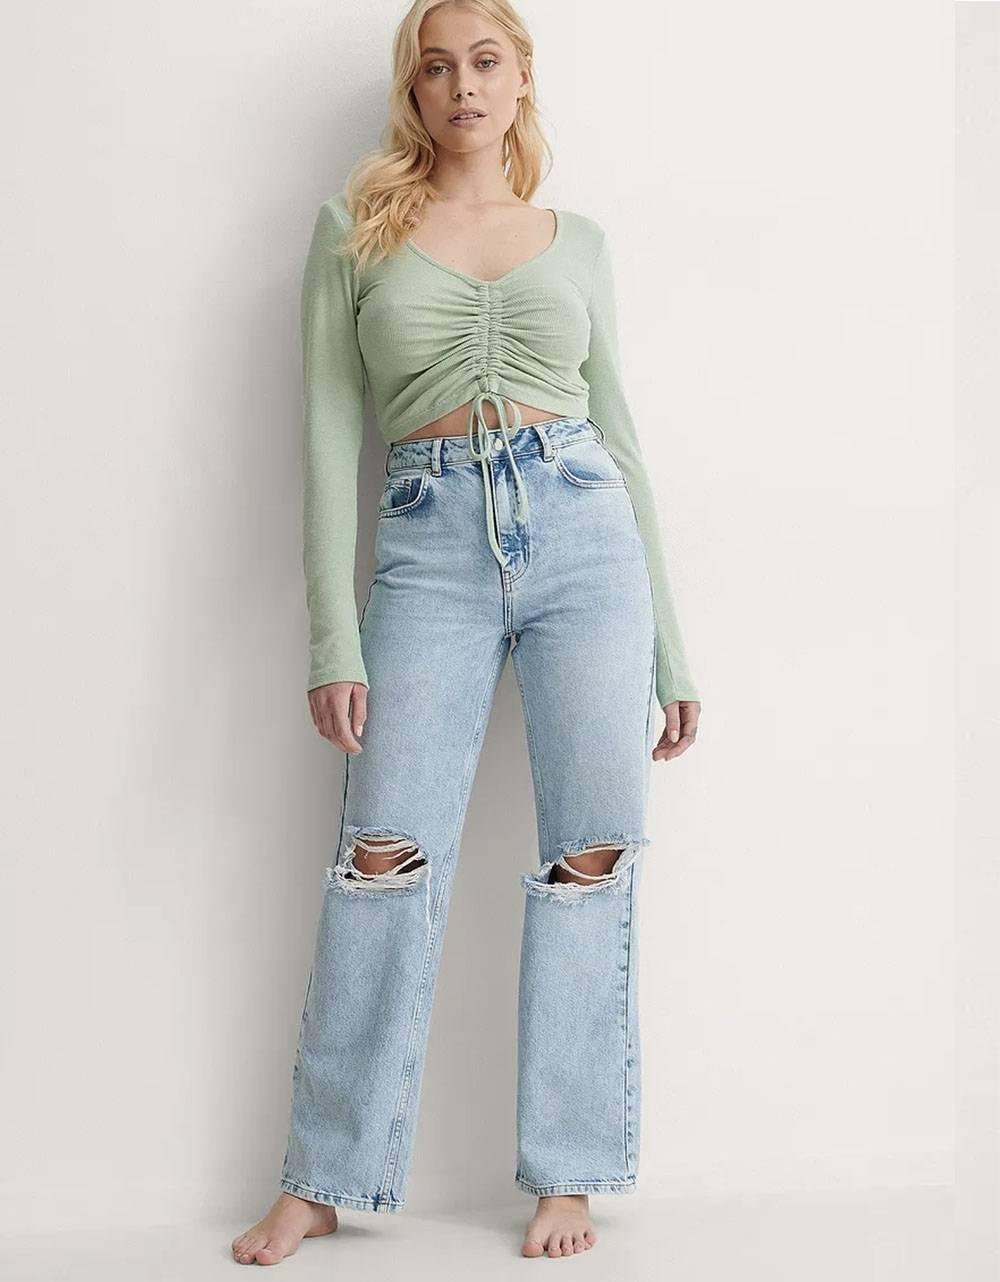 NA-KD wide leg denim - light blue NA-KD Jeans 53,28€